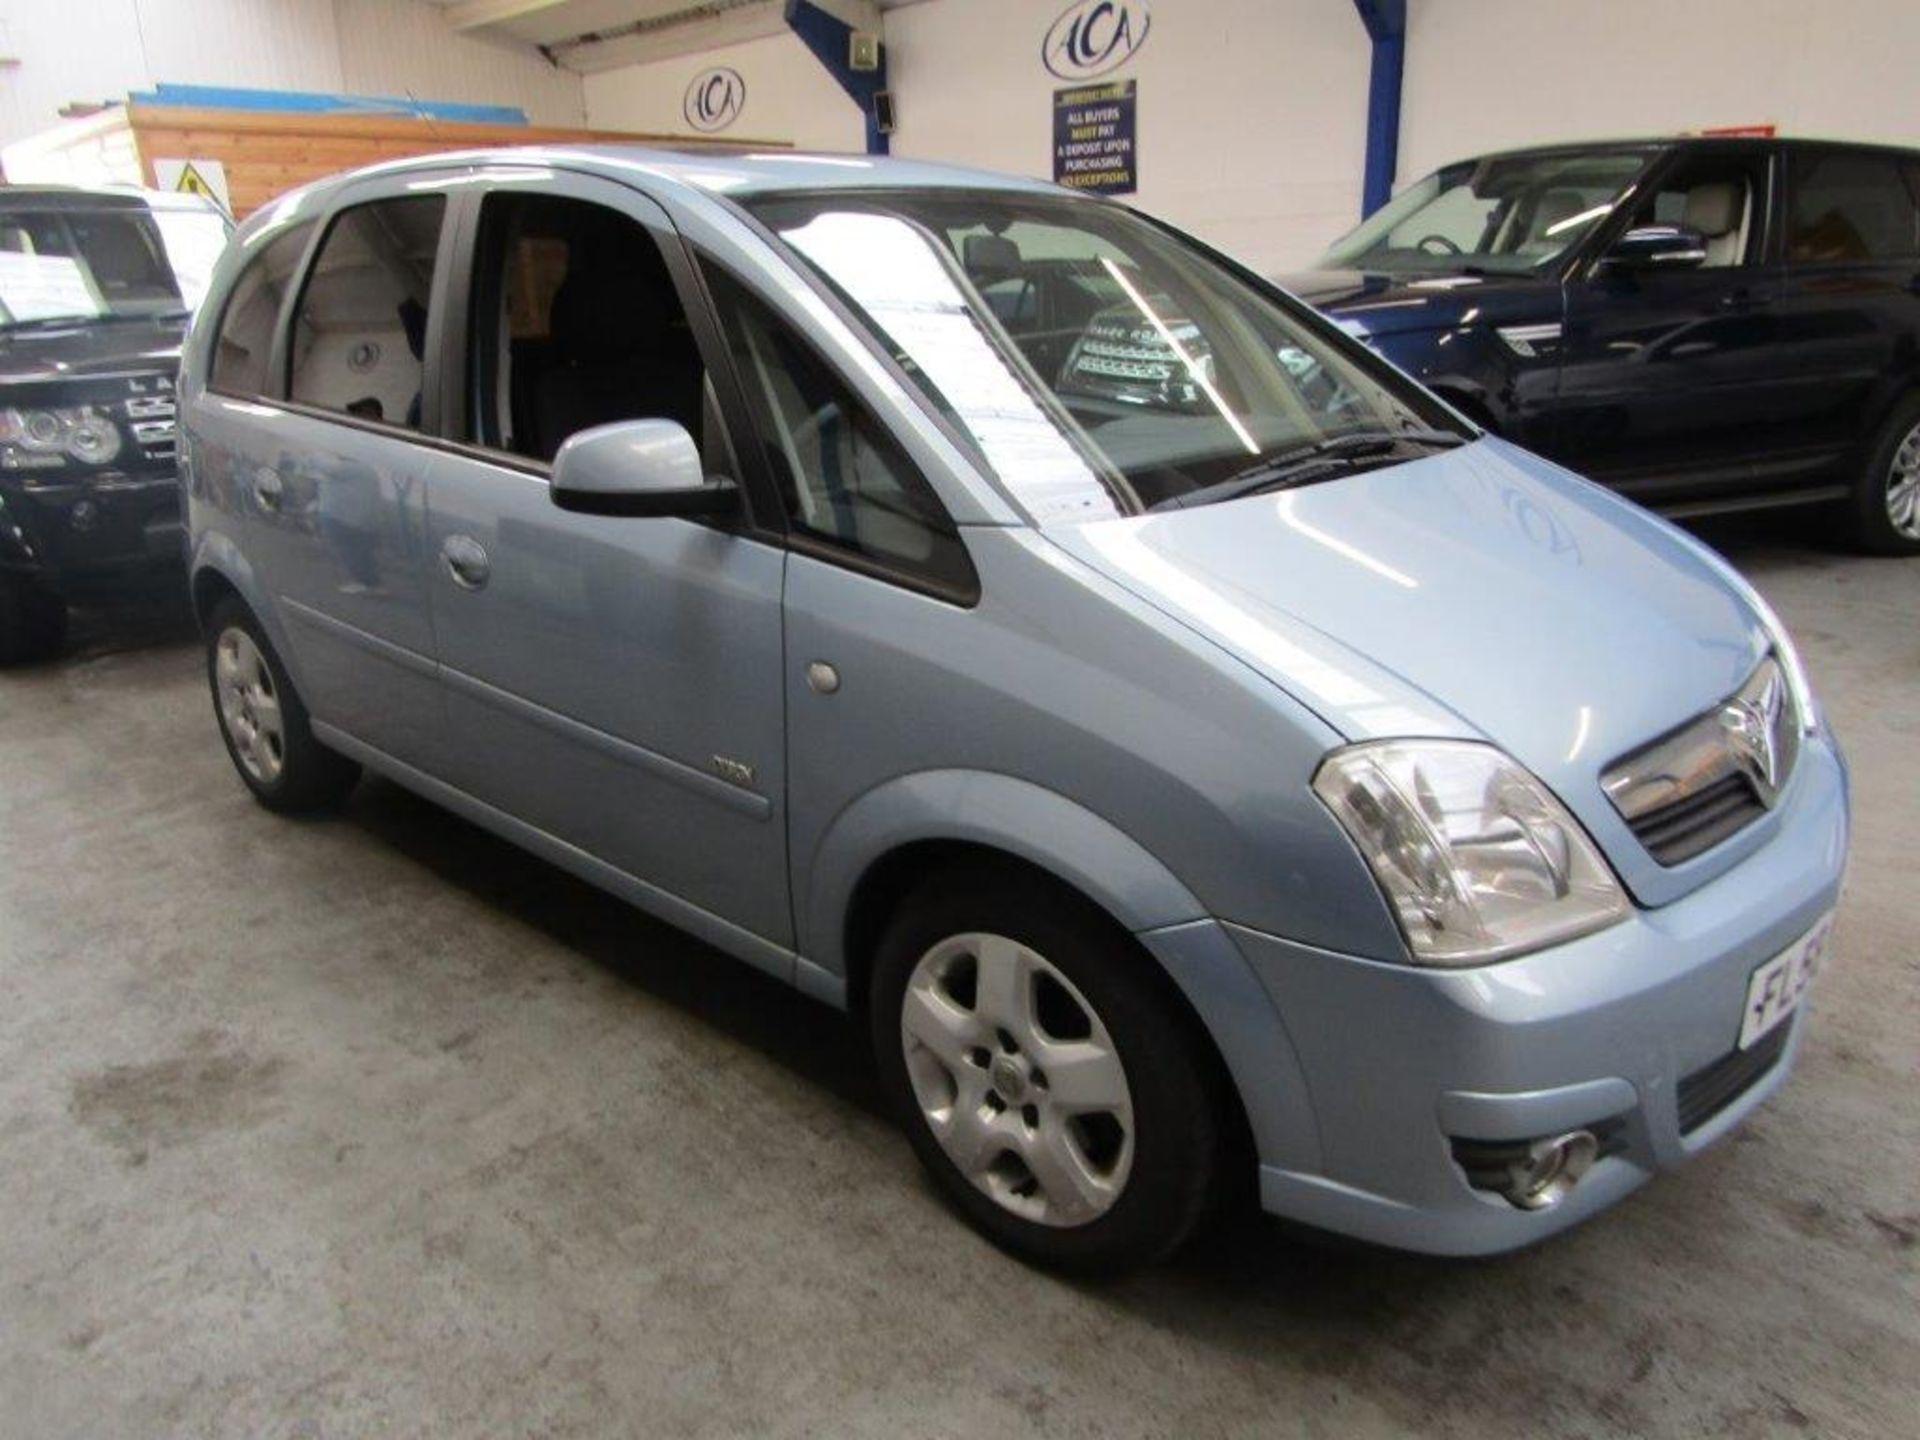 58 08 Vauxhall Meriva Design - Image 7 of 25